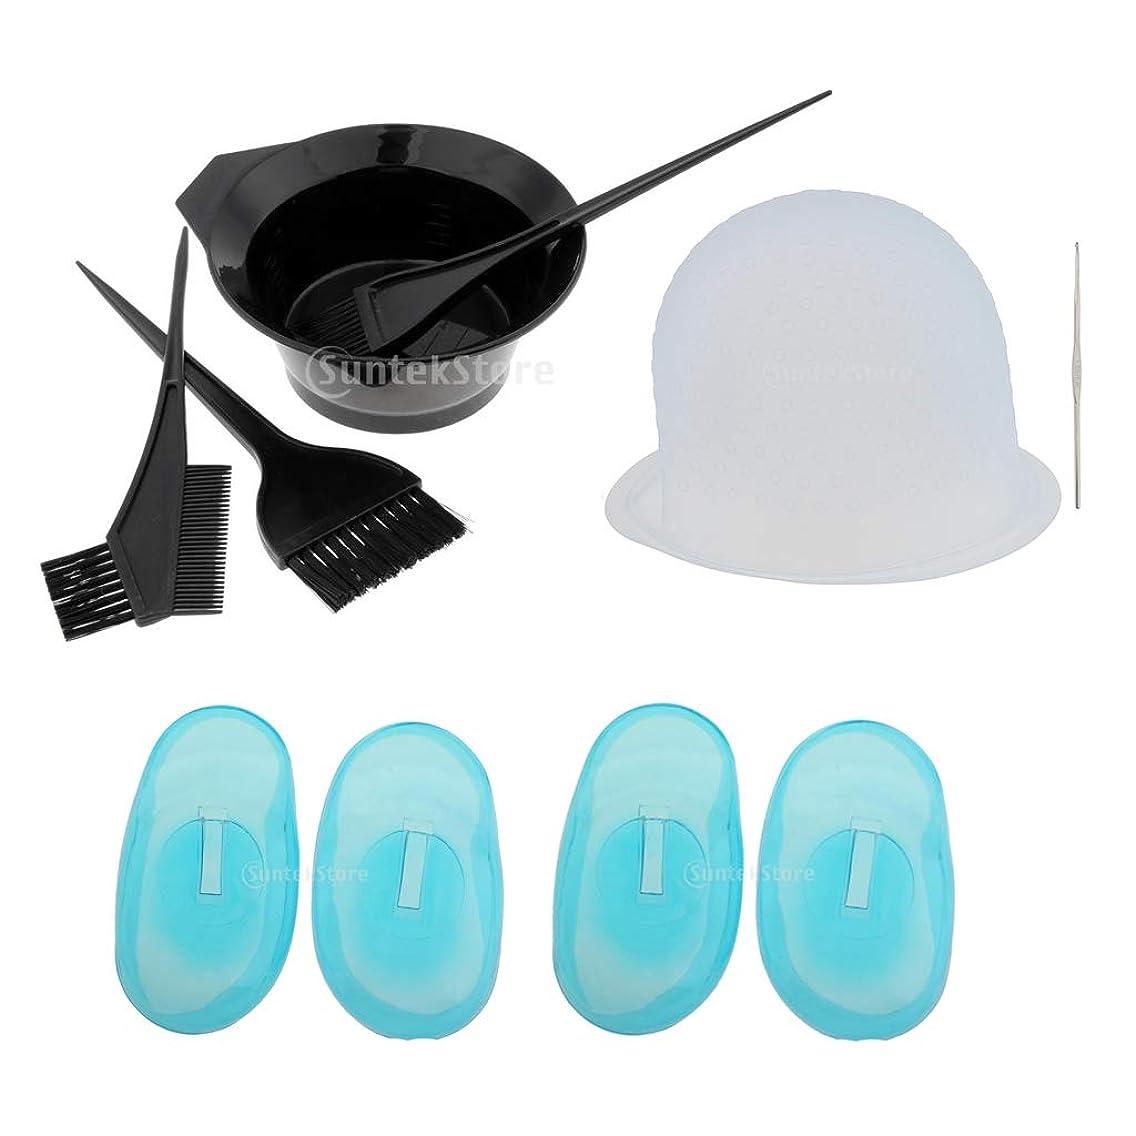 CUTICATE 9Pcs/Set Plastic Hair Dye Bowl Brushes Kit Hair Coloring Brushes Tinting Bowl Highlighting Cap Hook and Ear Covers Combo